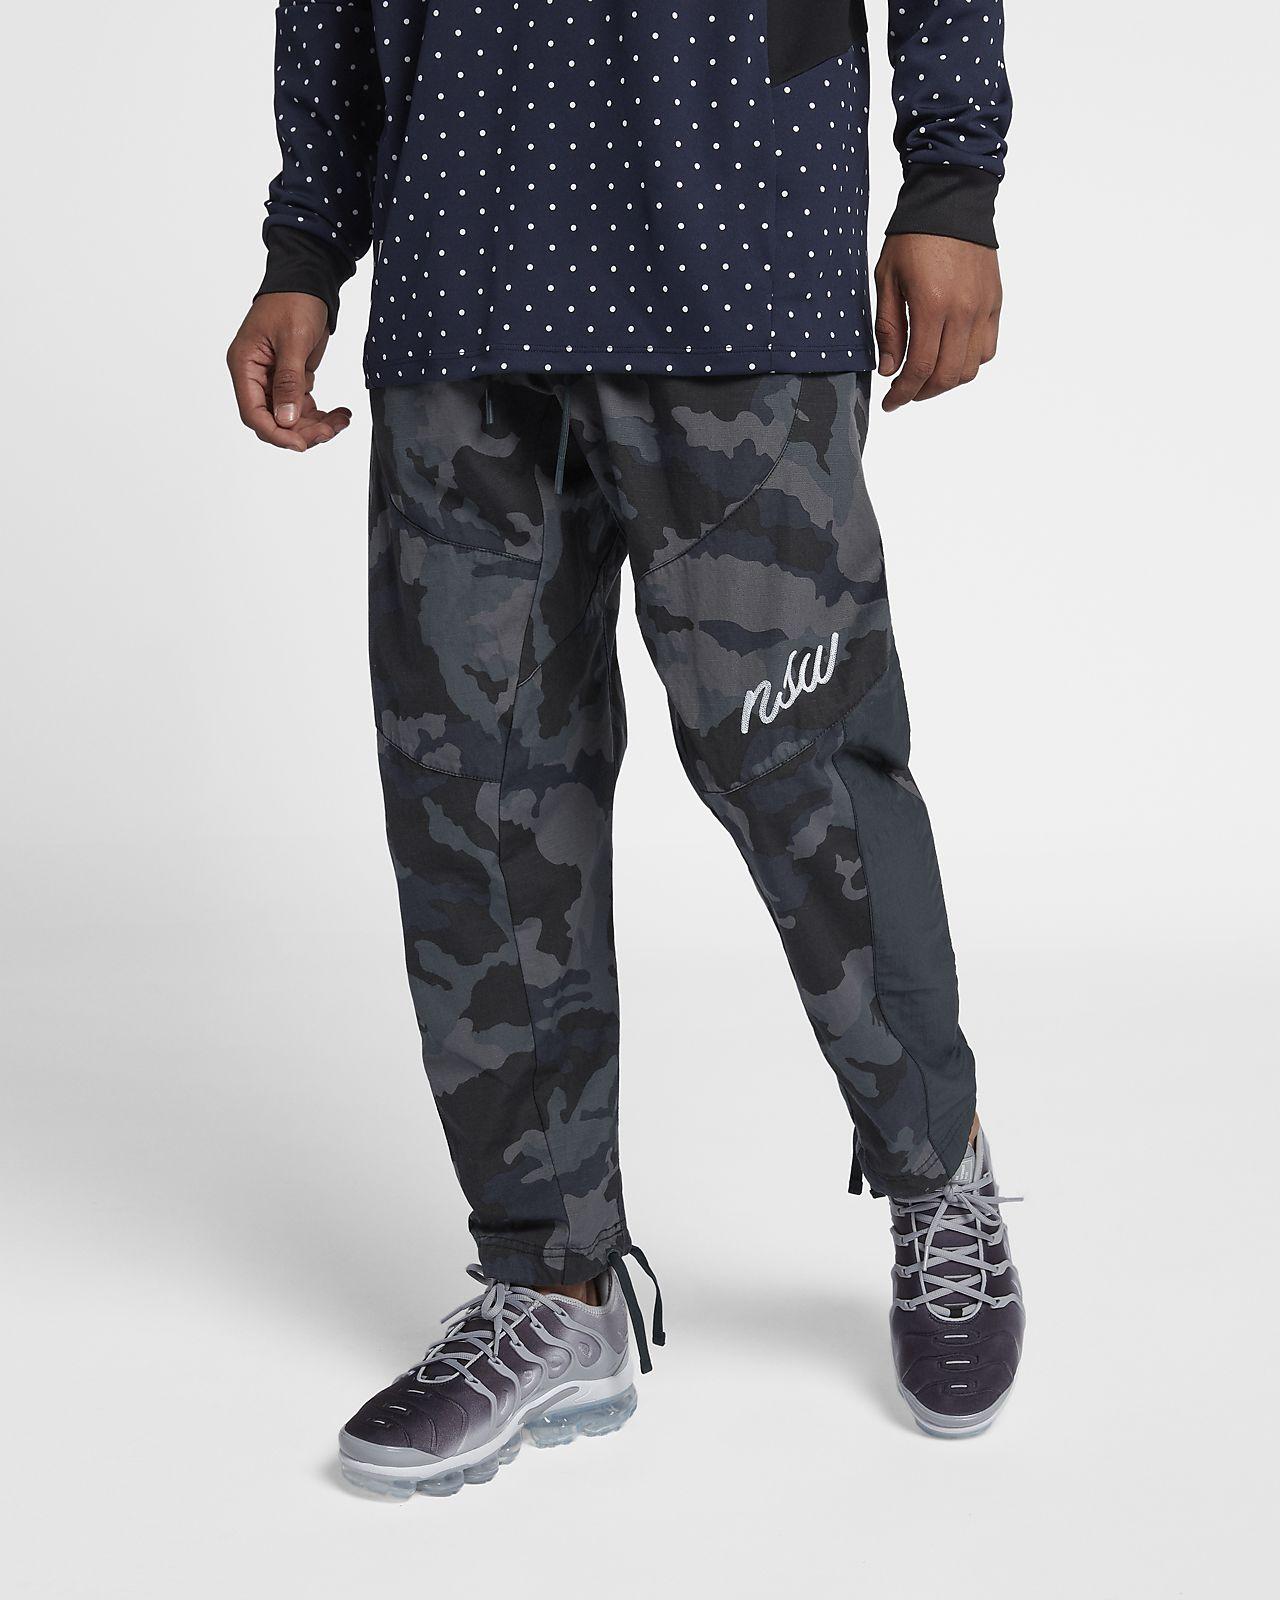 Pantalon de jogging camouflage tissé Nike Sportswear NSW pour Homme